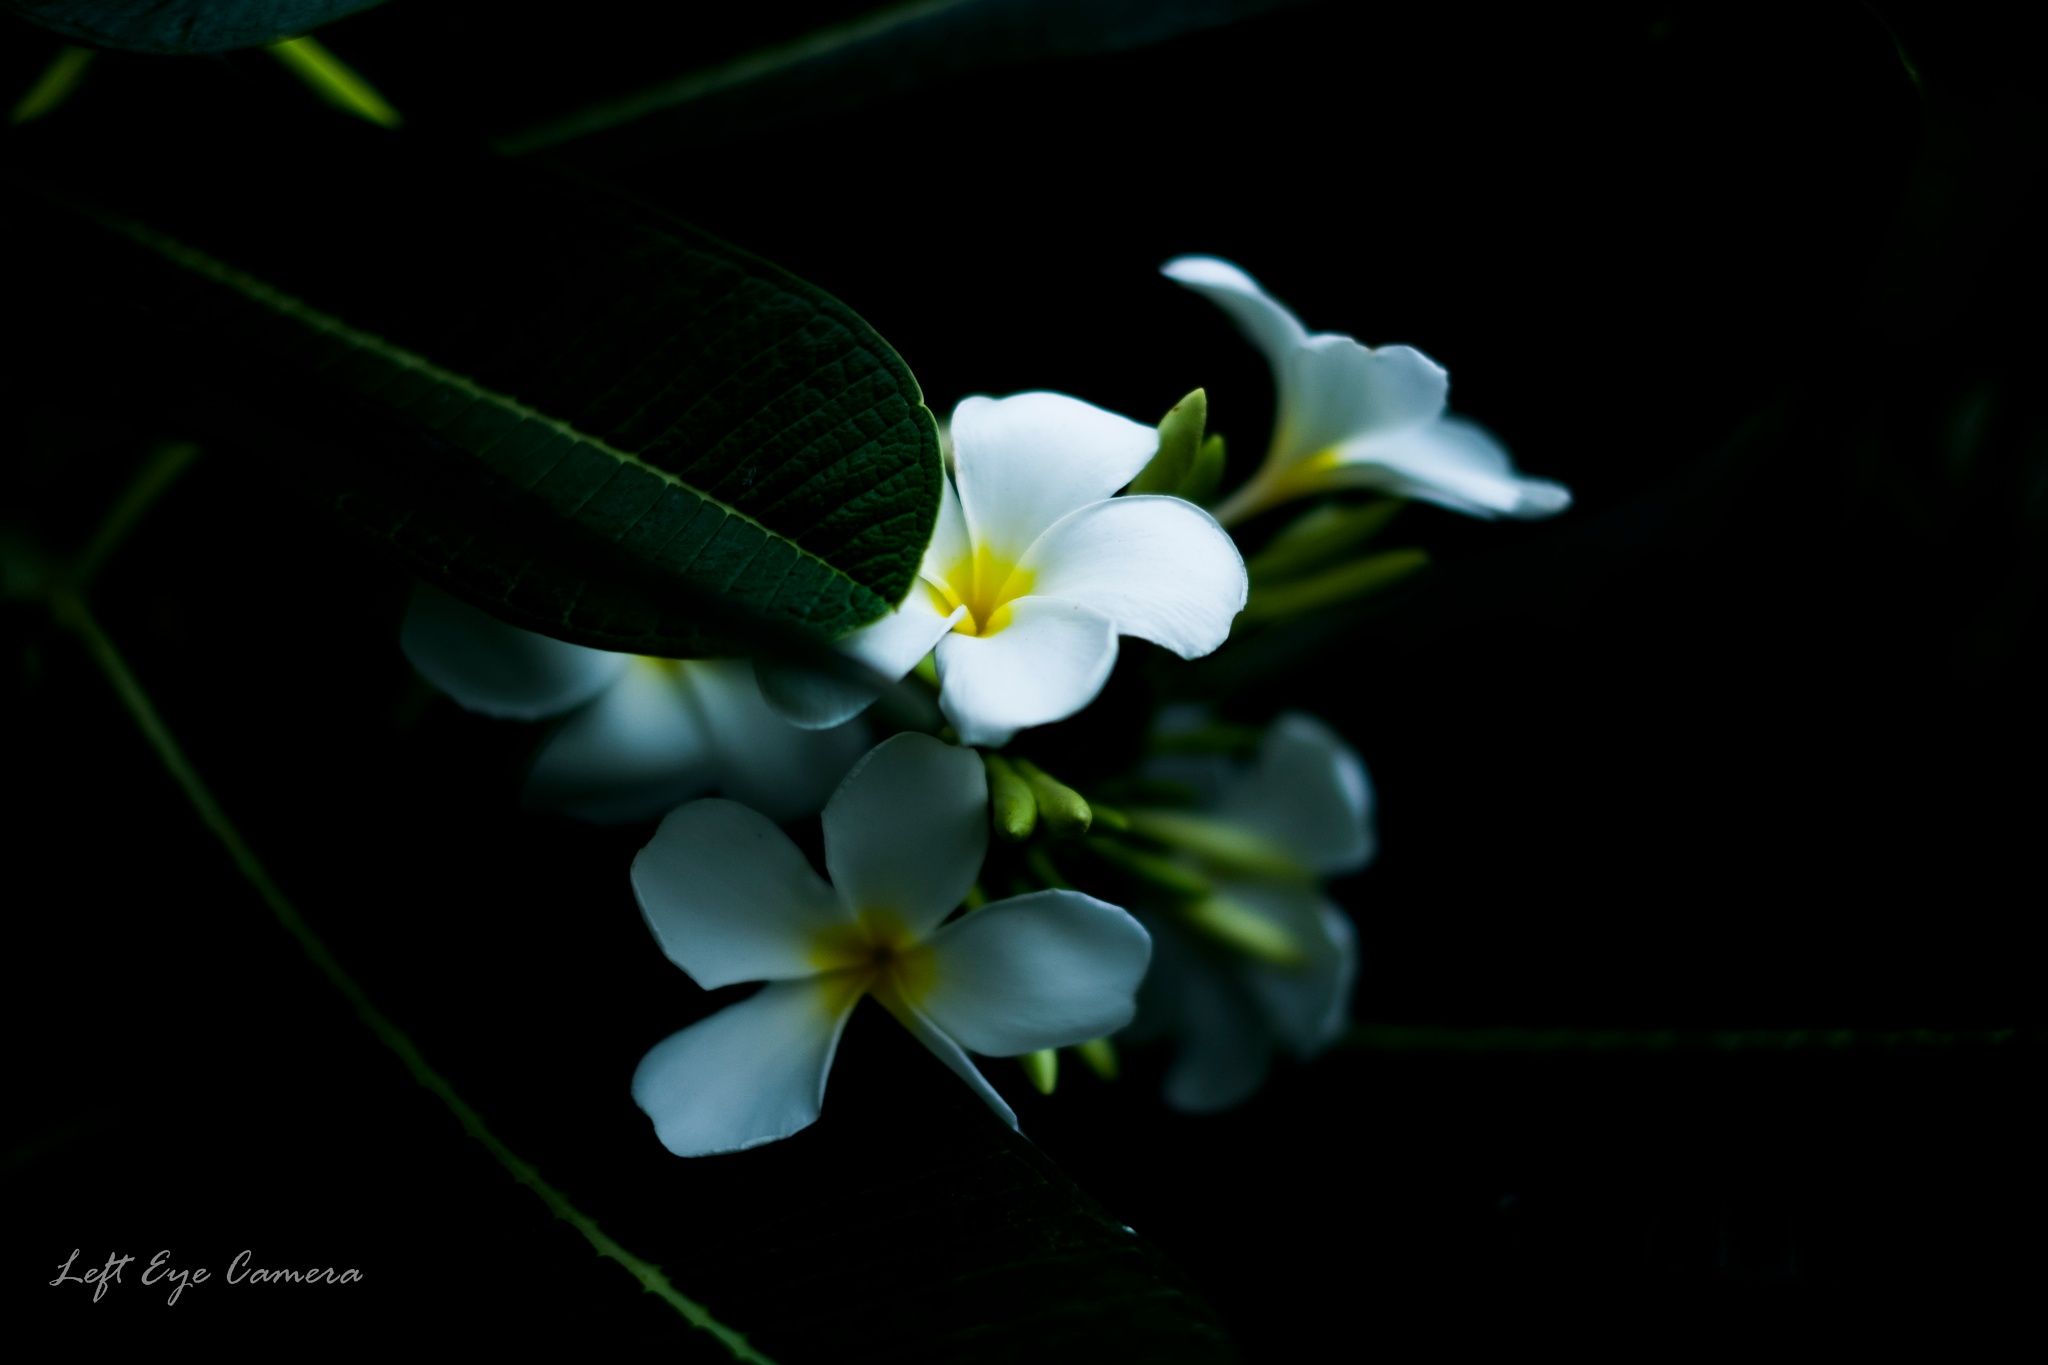 no rain no flowers by Chairat Buntaotook